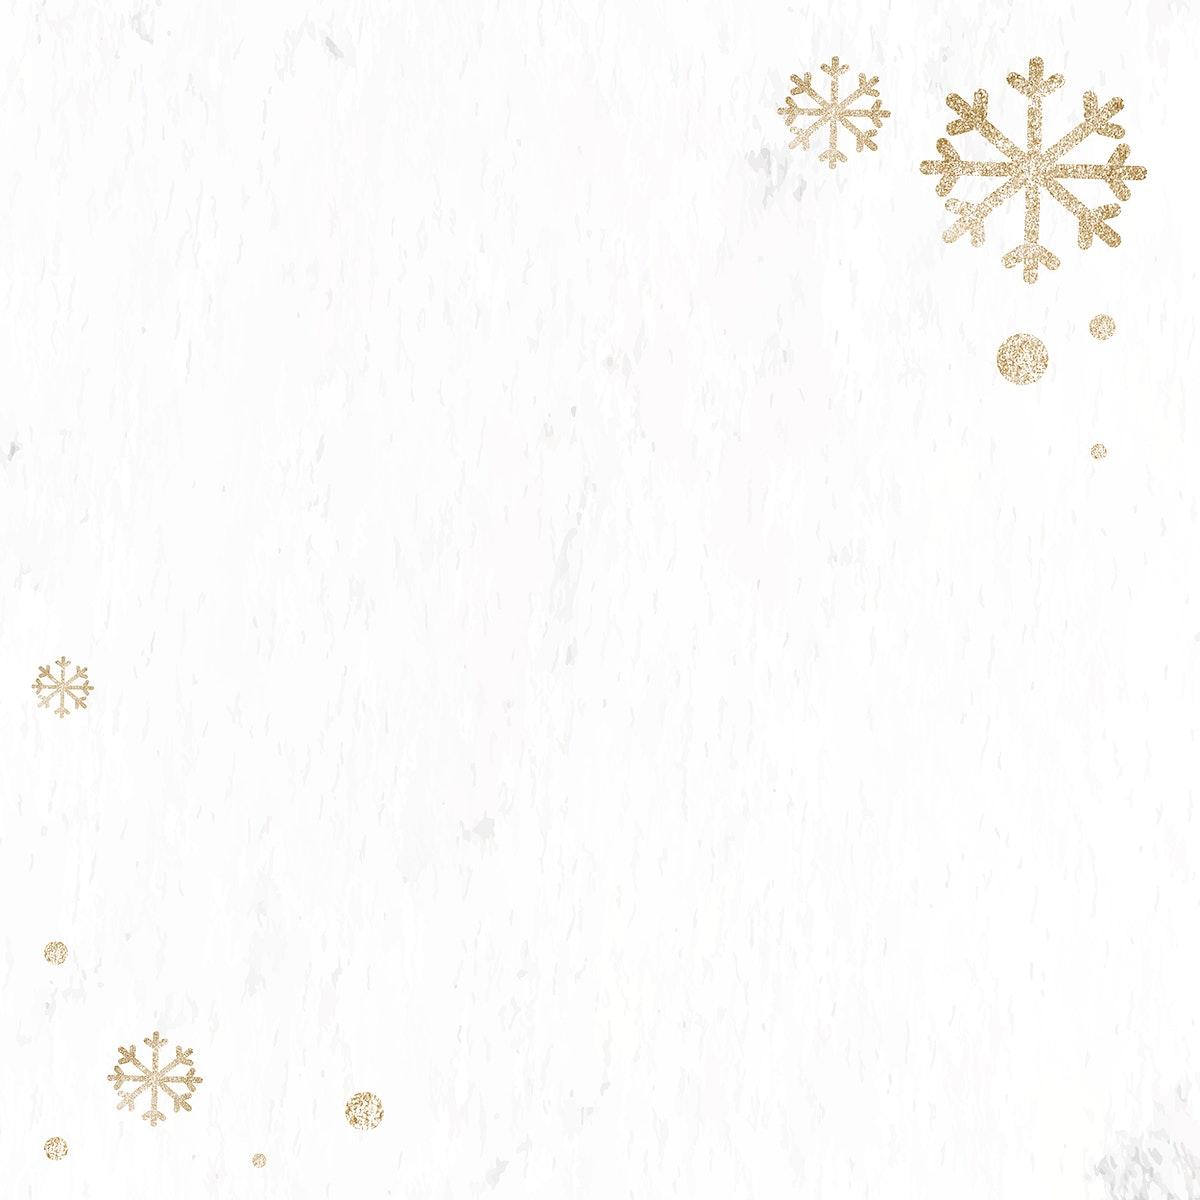 Glittery snowflake Christmas background vector